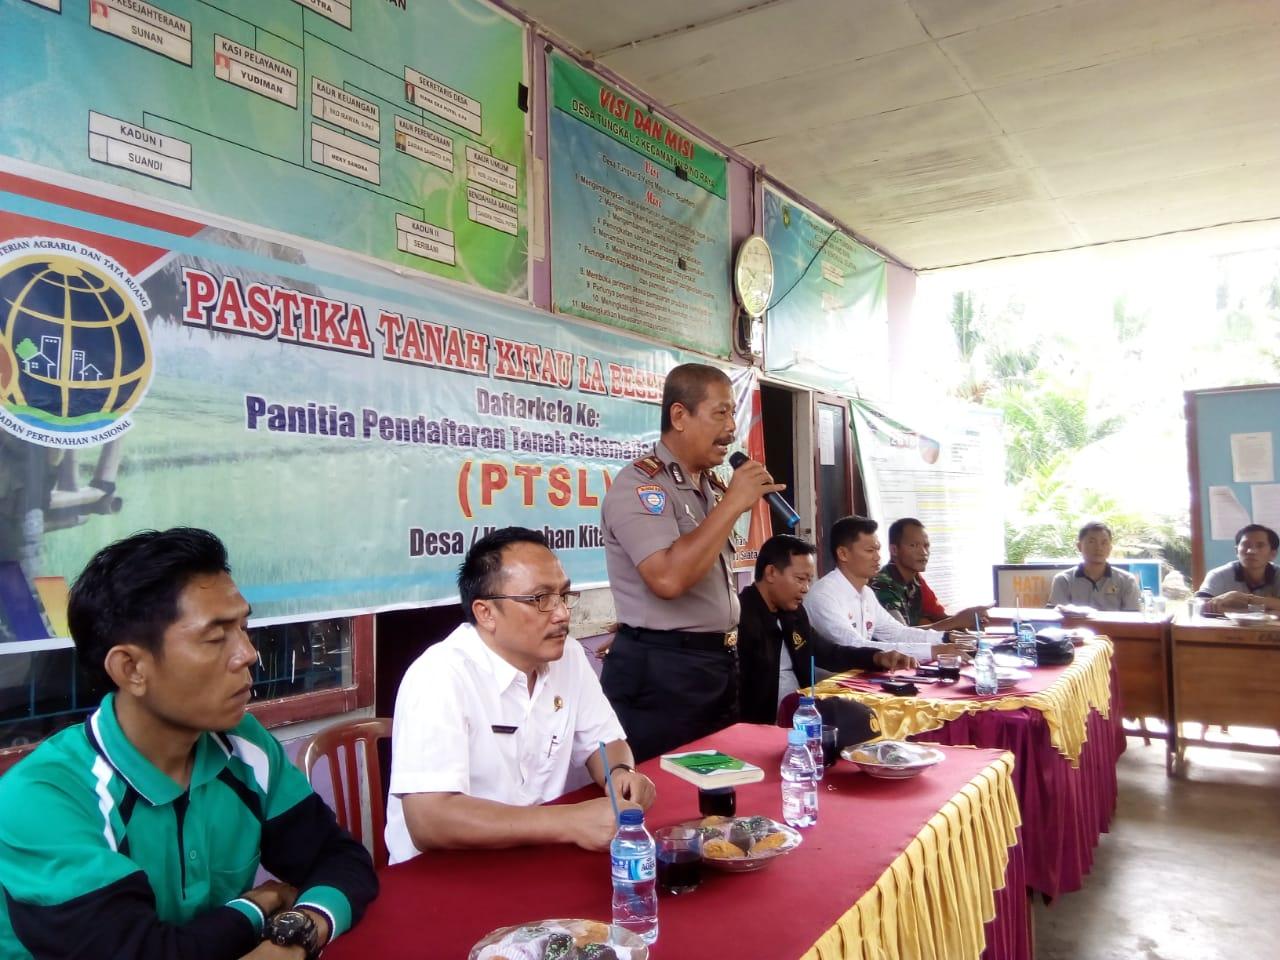 Sinergitas Antar Instansi, Sat Binmas Dampingi BPN Sosialisasi PTSL